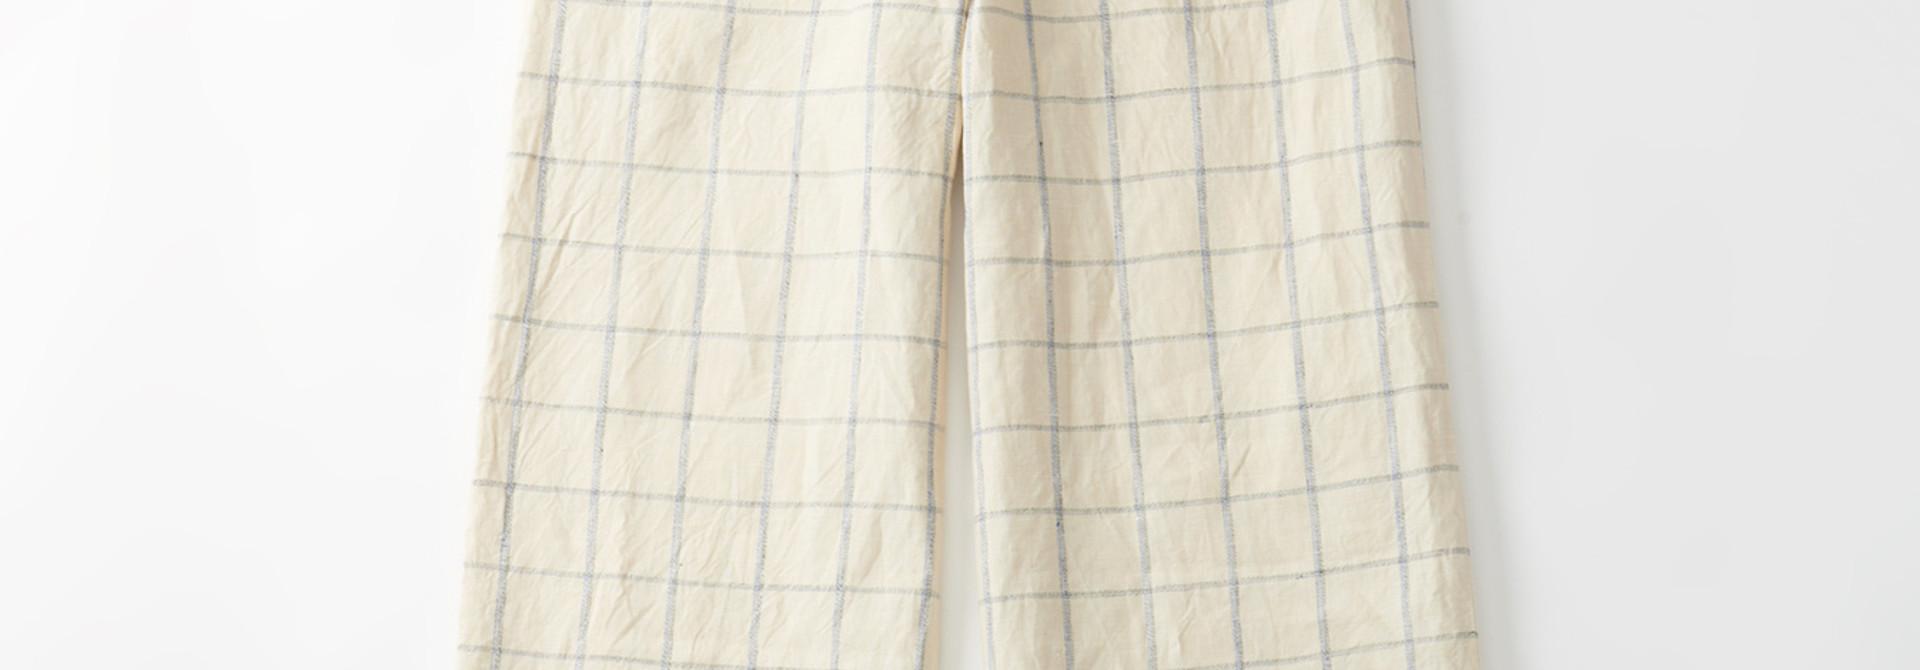 WH Linen 4545 Check Pants